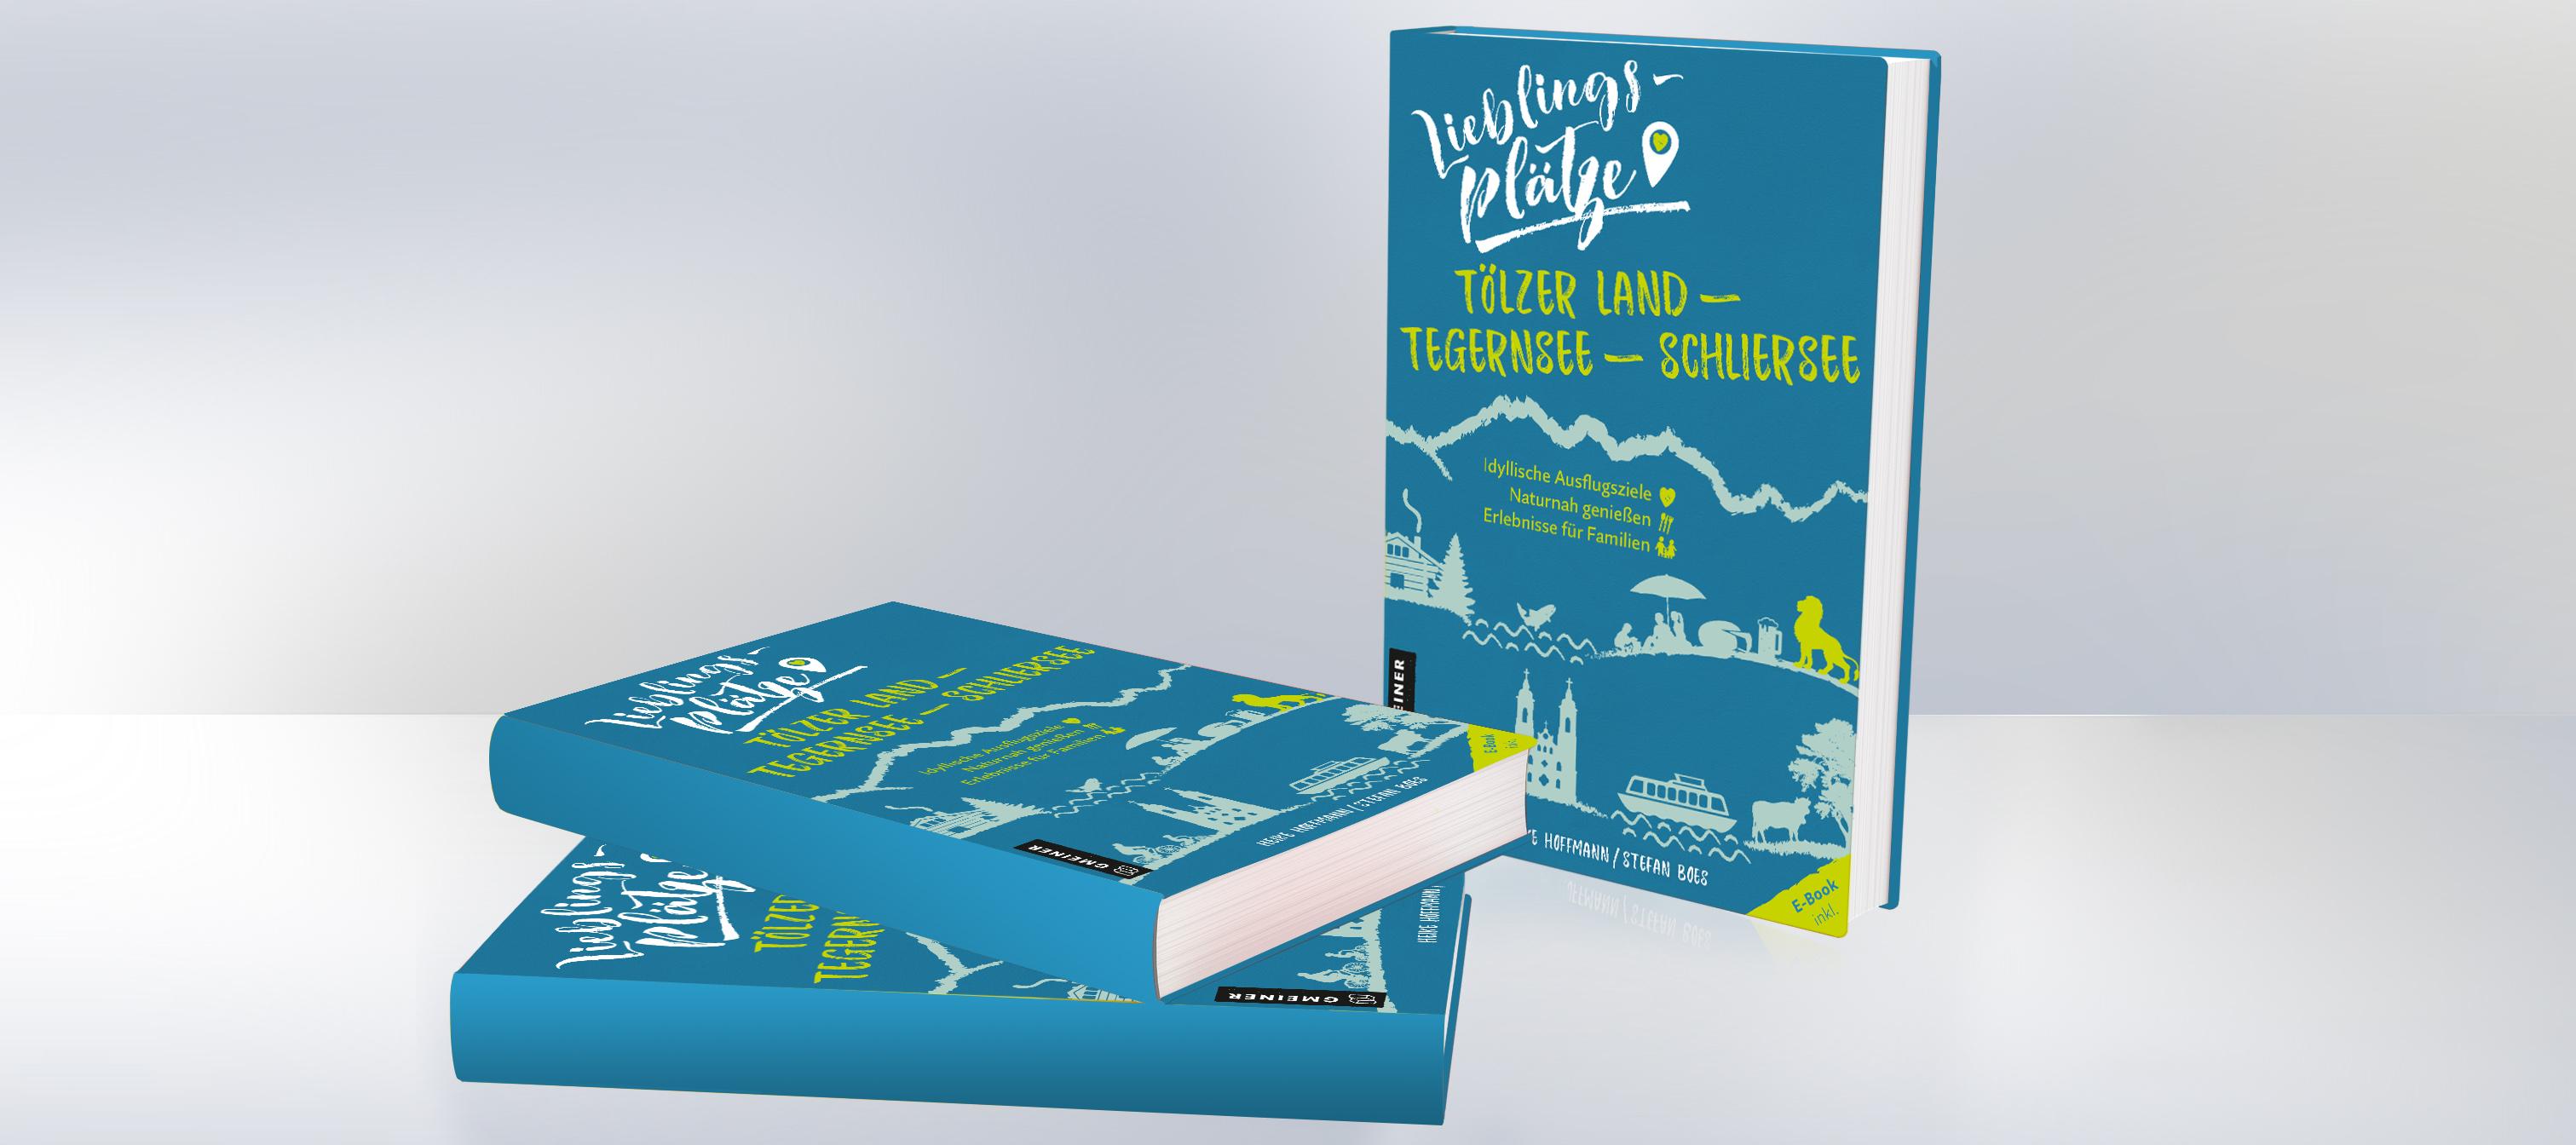 Buch-Tipp: Lieblingsplätze: Tölzer Land – Tegernsee – Schliersee